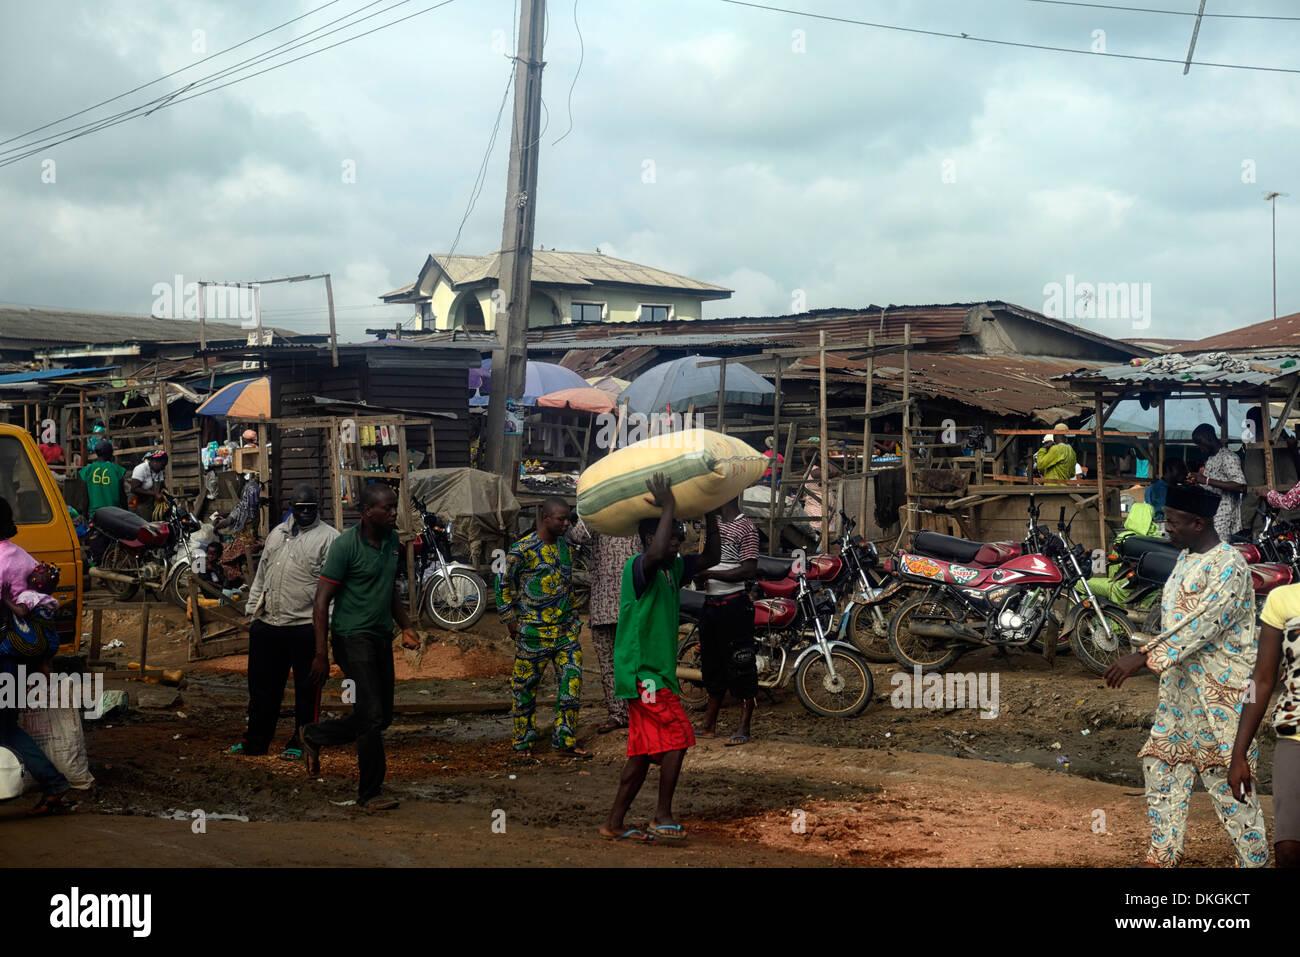 people walking open air outdoor market shops stalls ibadan lagos nigeria buying selling buy sell - Stock Image